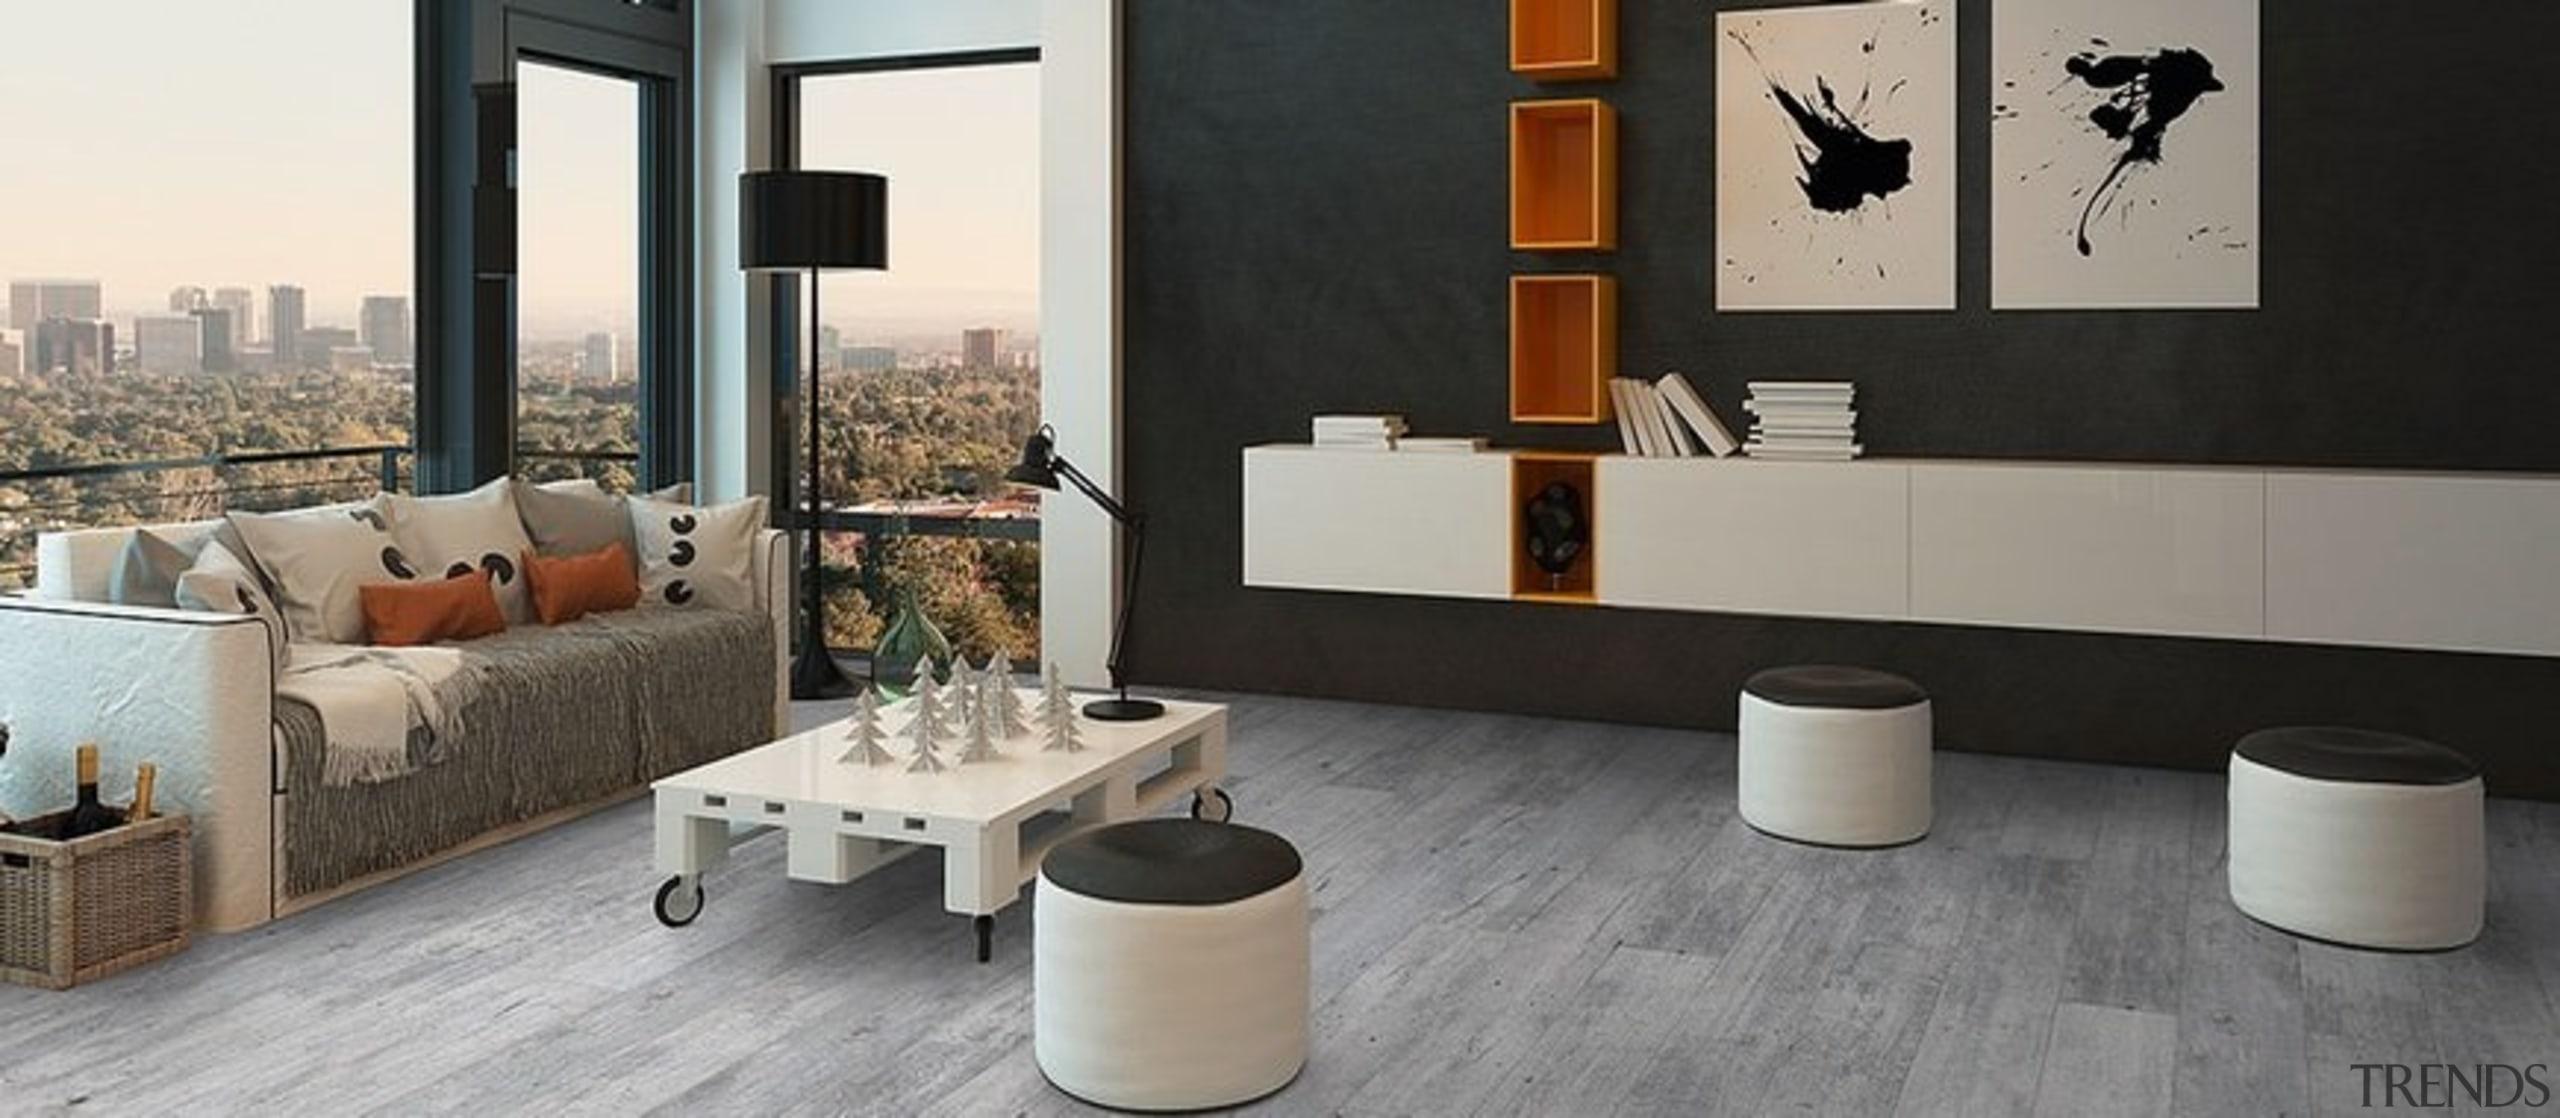 CERAMIN NEO 2.0 - CERAMIN NEO 2.0 - floor, flooring, furniture, interior design, product design, room, table, gray, black